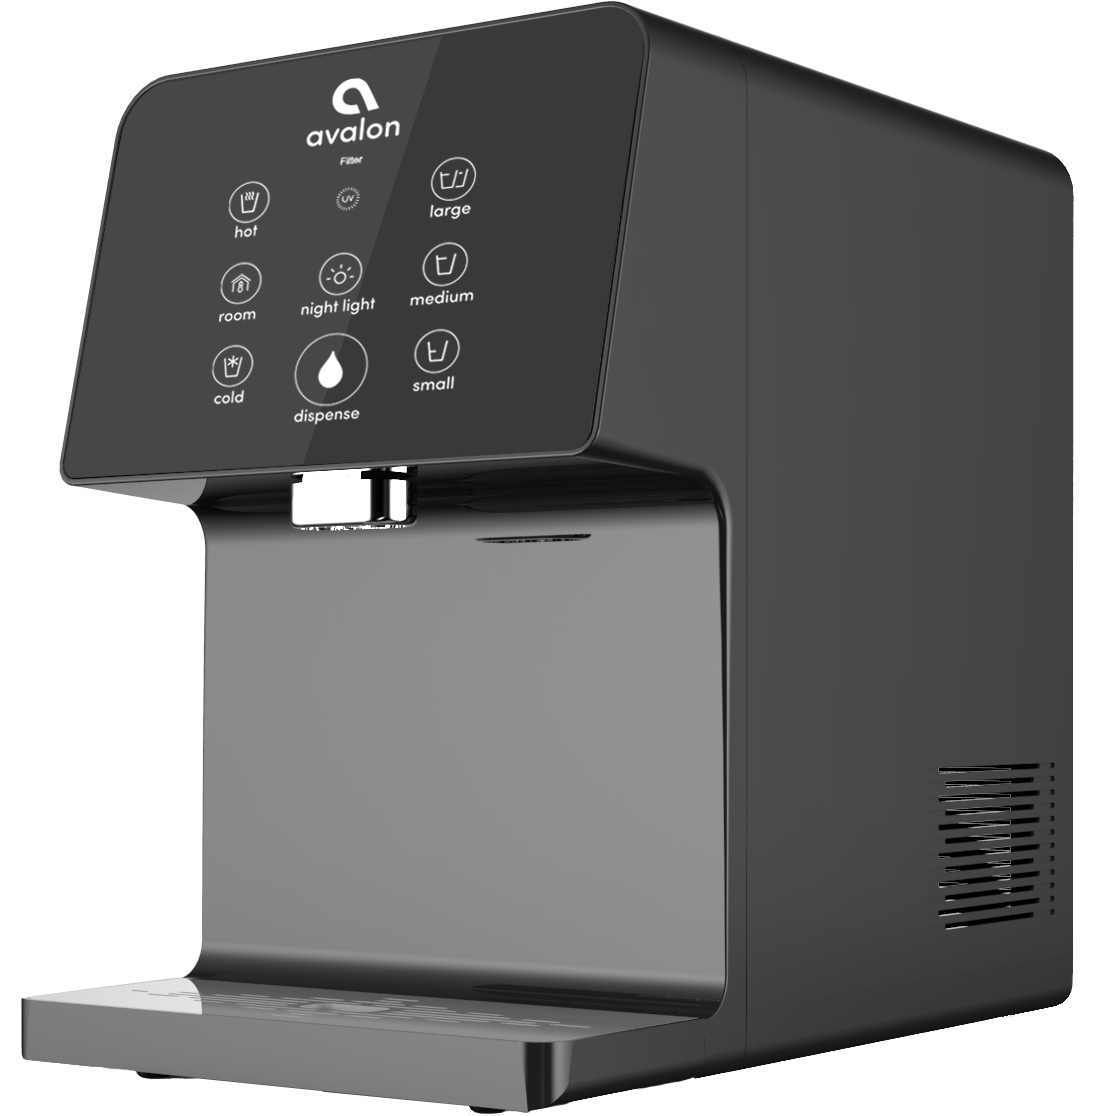 Avalon Electric Countertop Bottleless Water Cooler Water Dispenser, 3 Temperatures, UV Cleaning, 3 Dispensing Volumes- Black